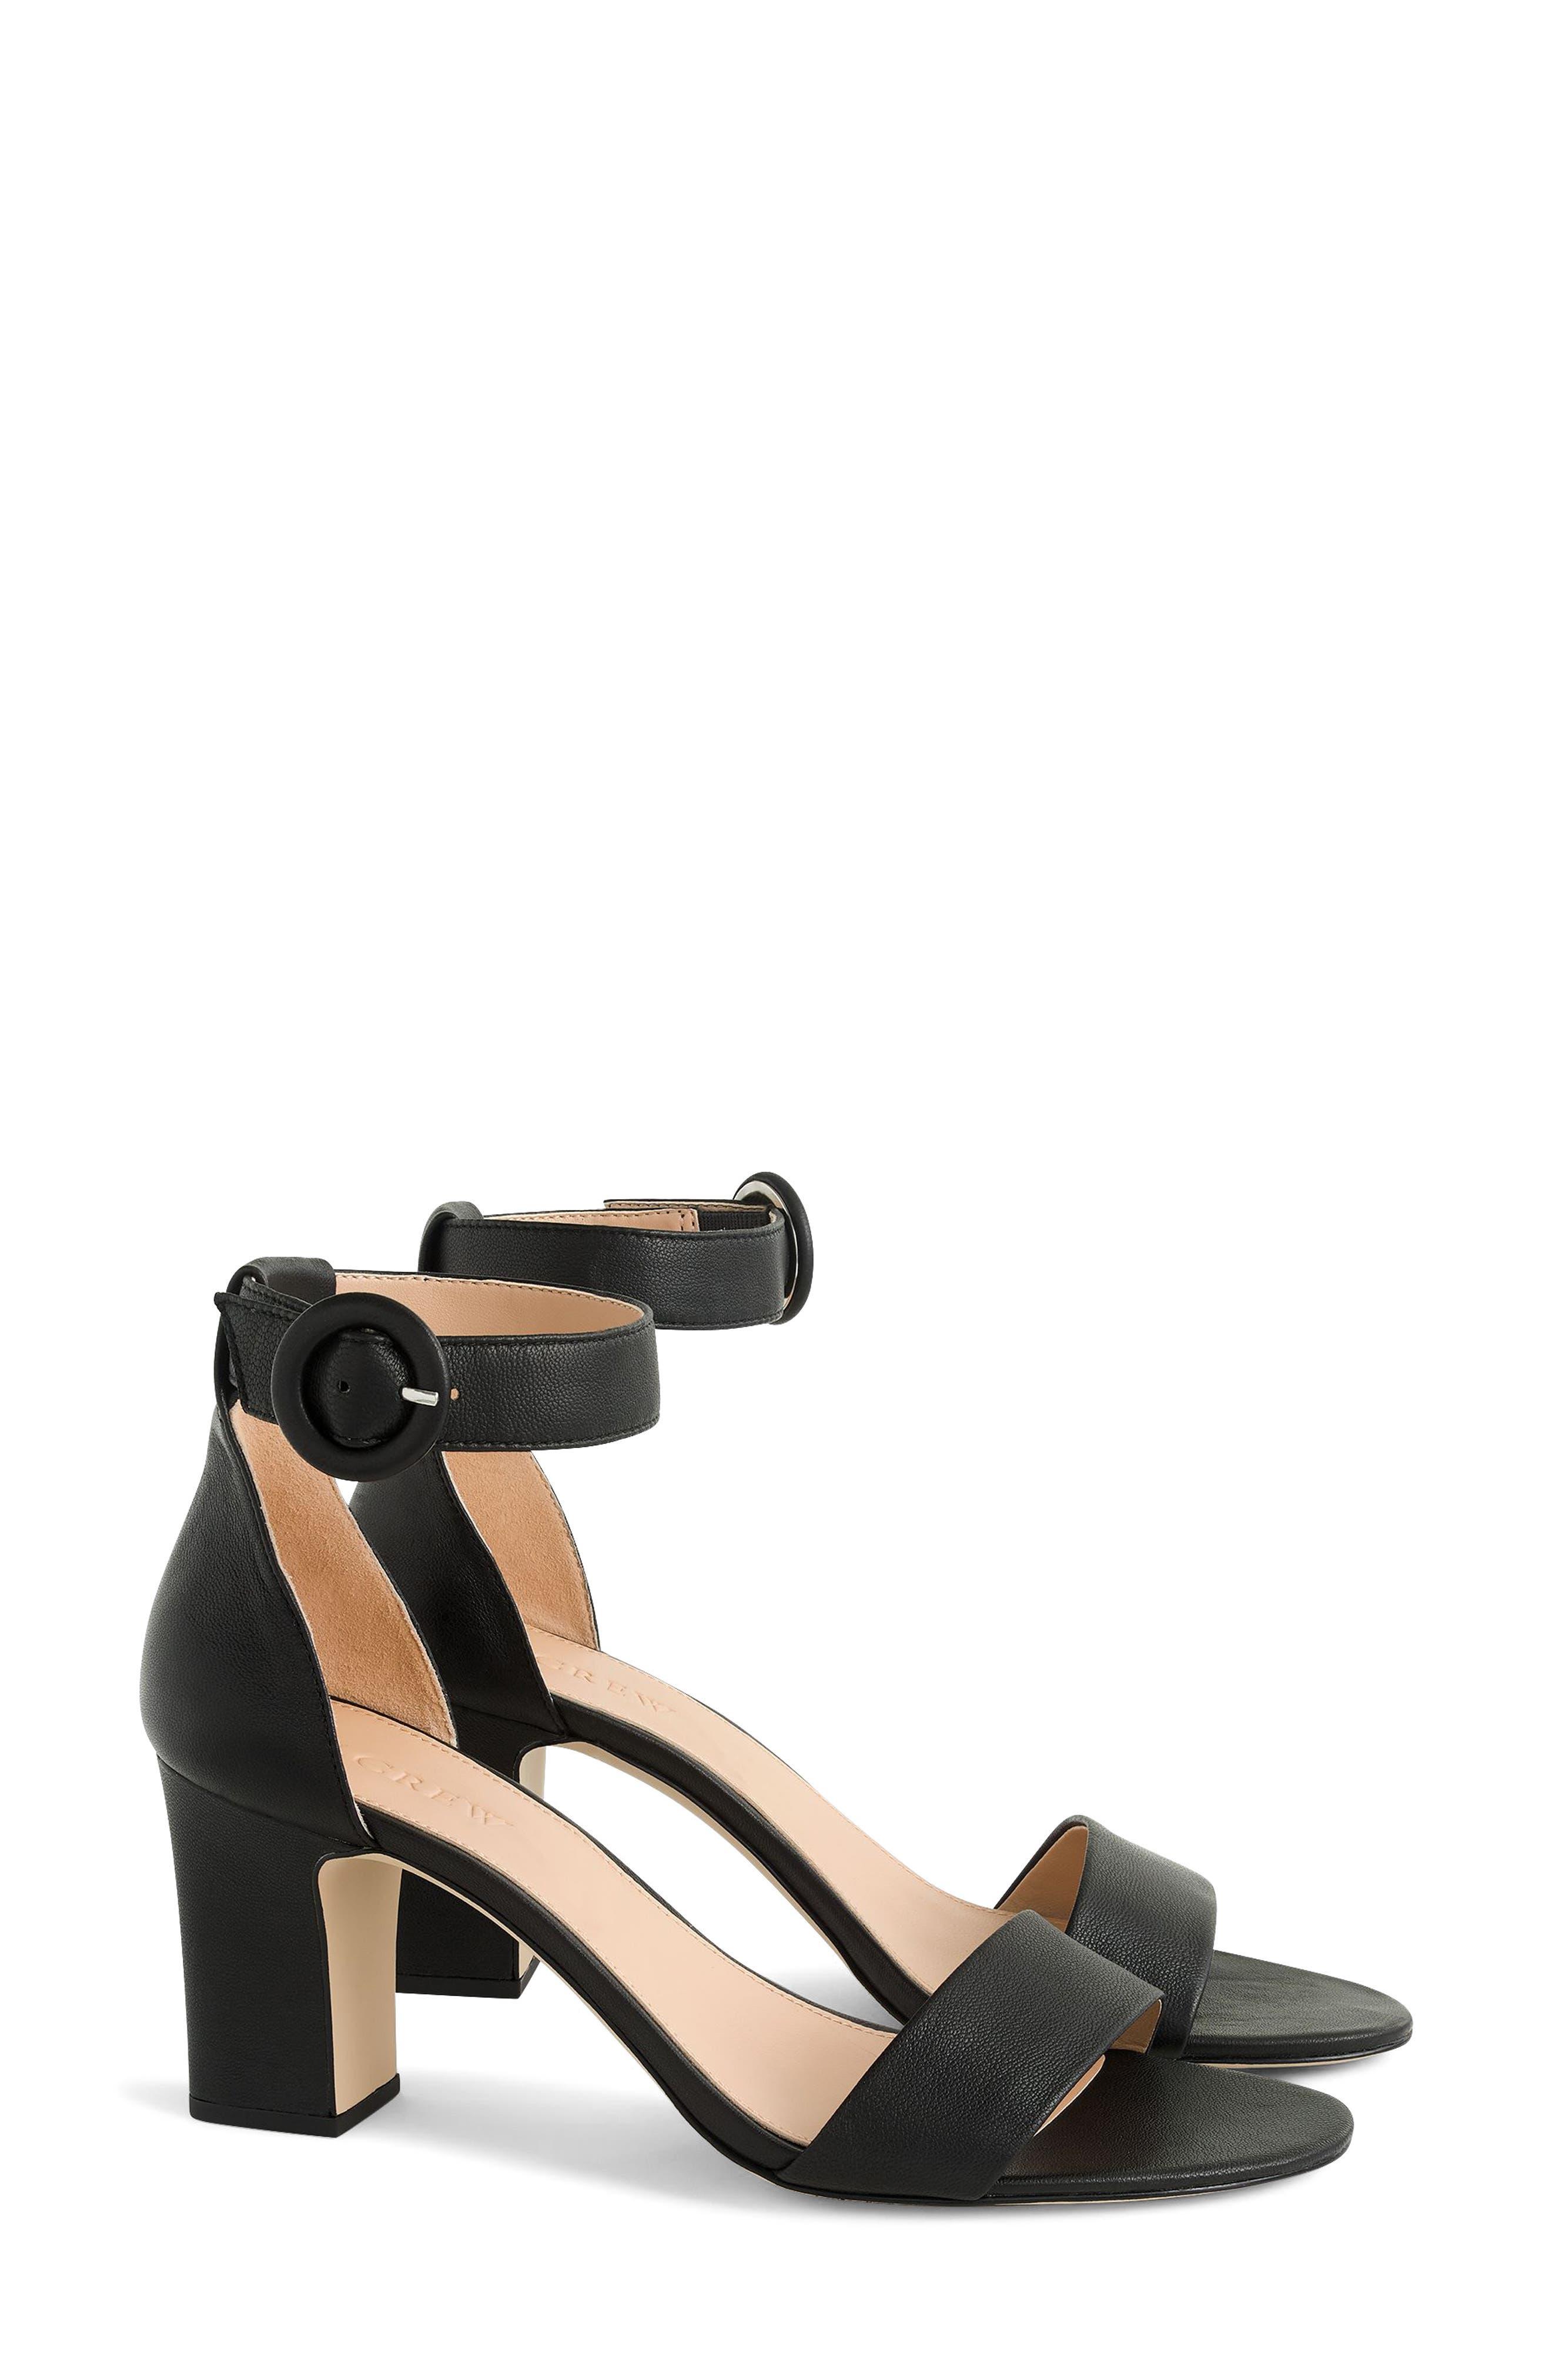 Remi Ankle Strap Sandal,                             Main thumbnail 1, color,                             Black